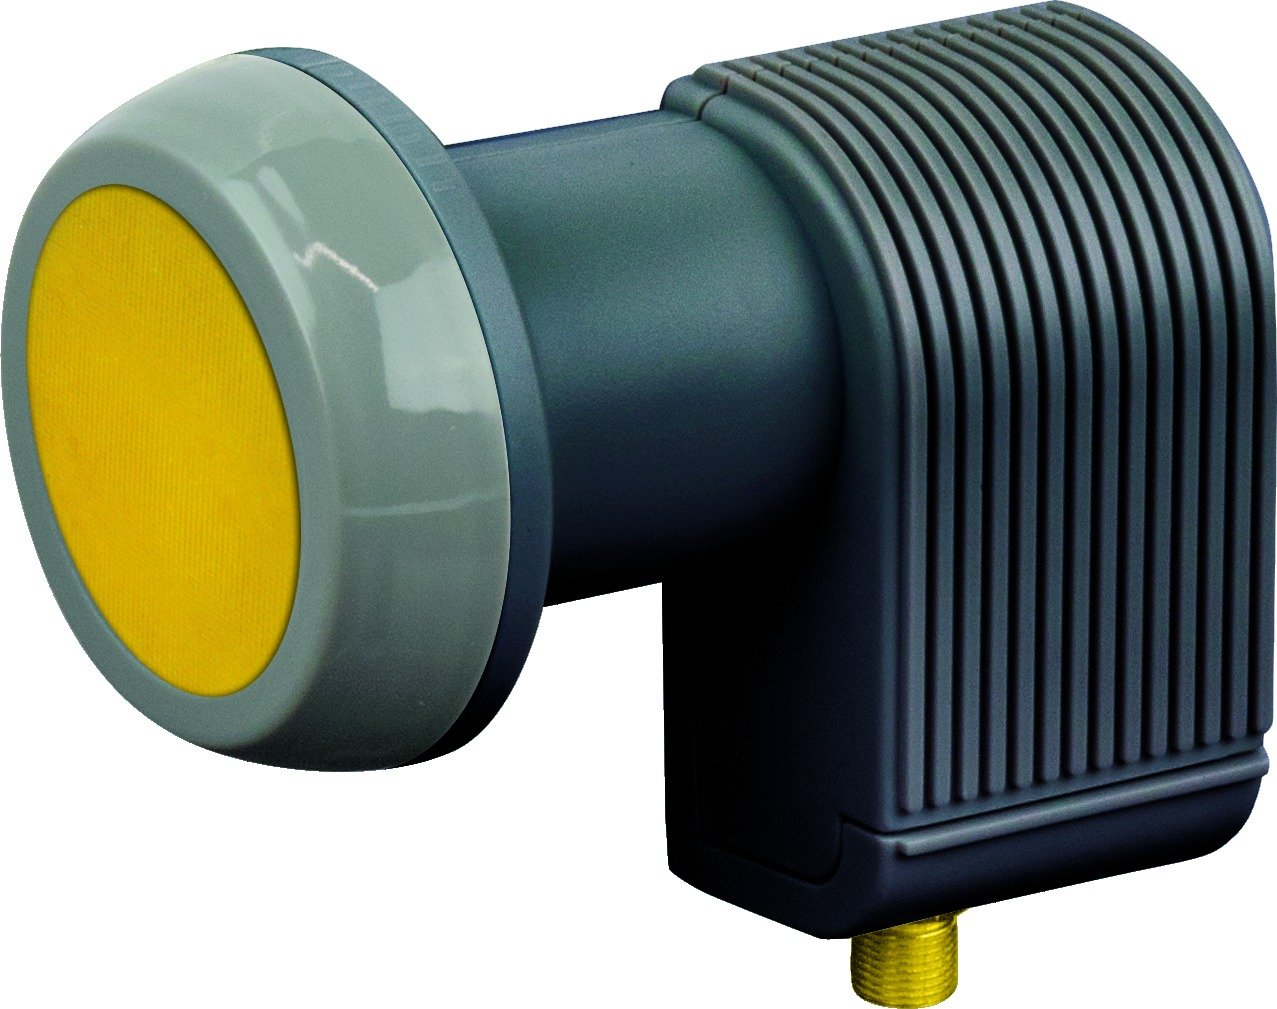 Schwaiger Single LNB 40mm Sun Protect Hellgrau